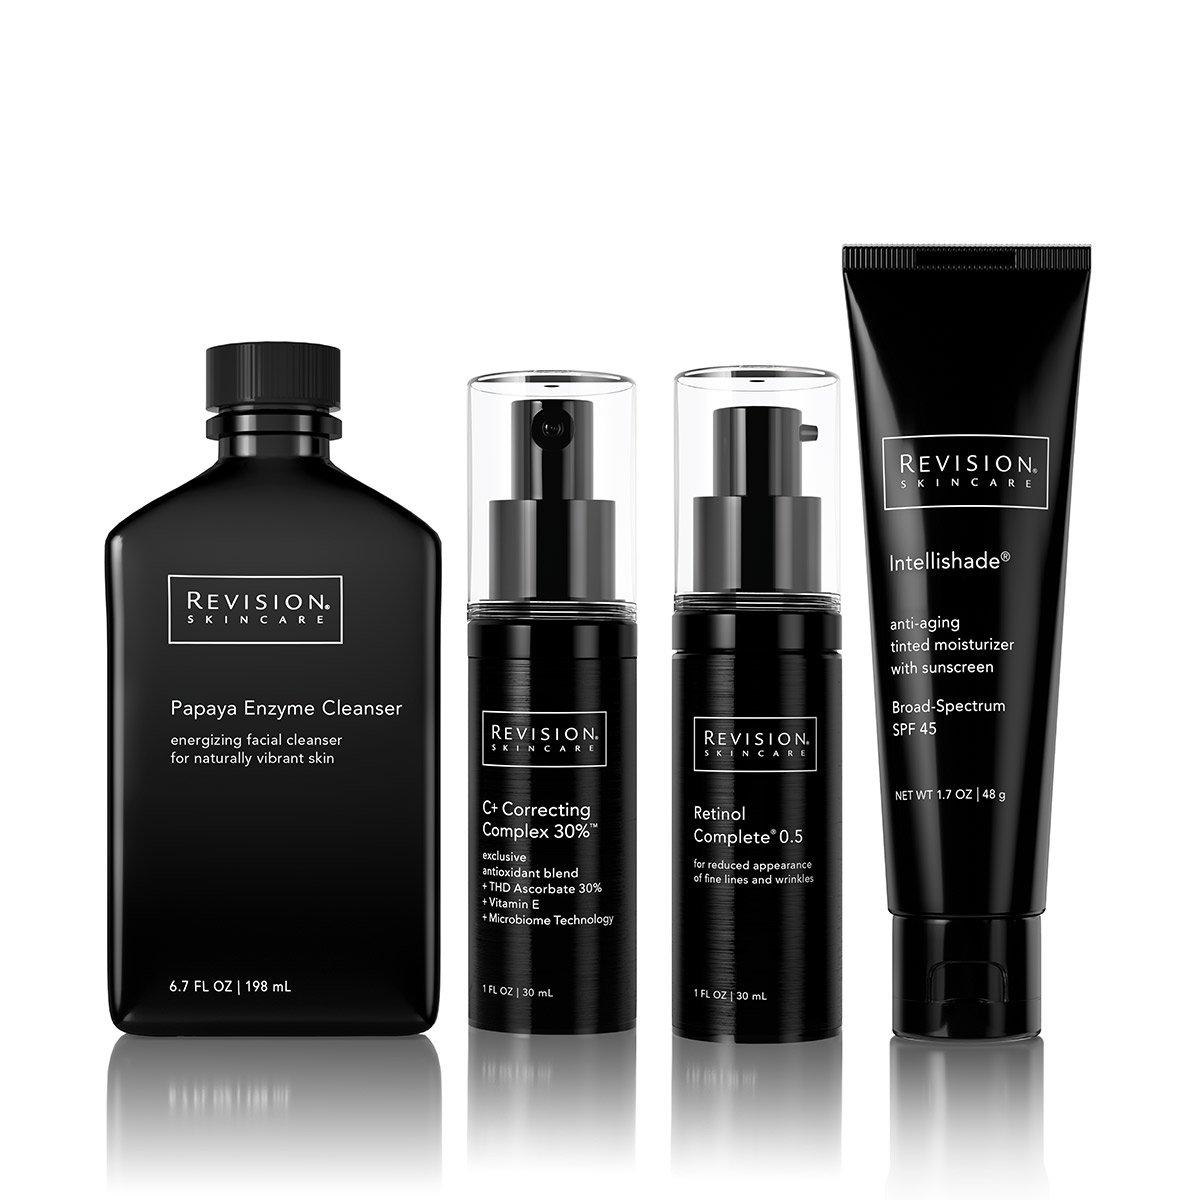 revision skincare products ellemes medical spa atlanta